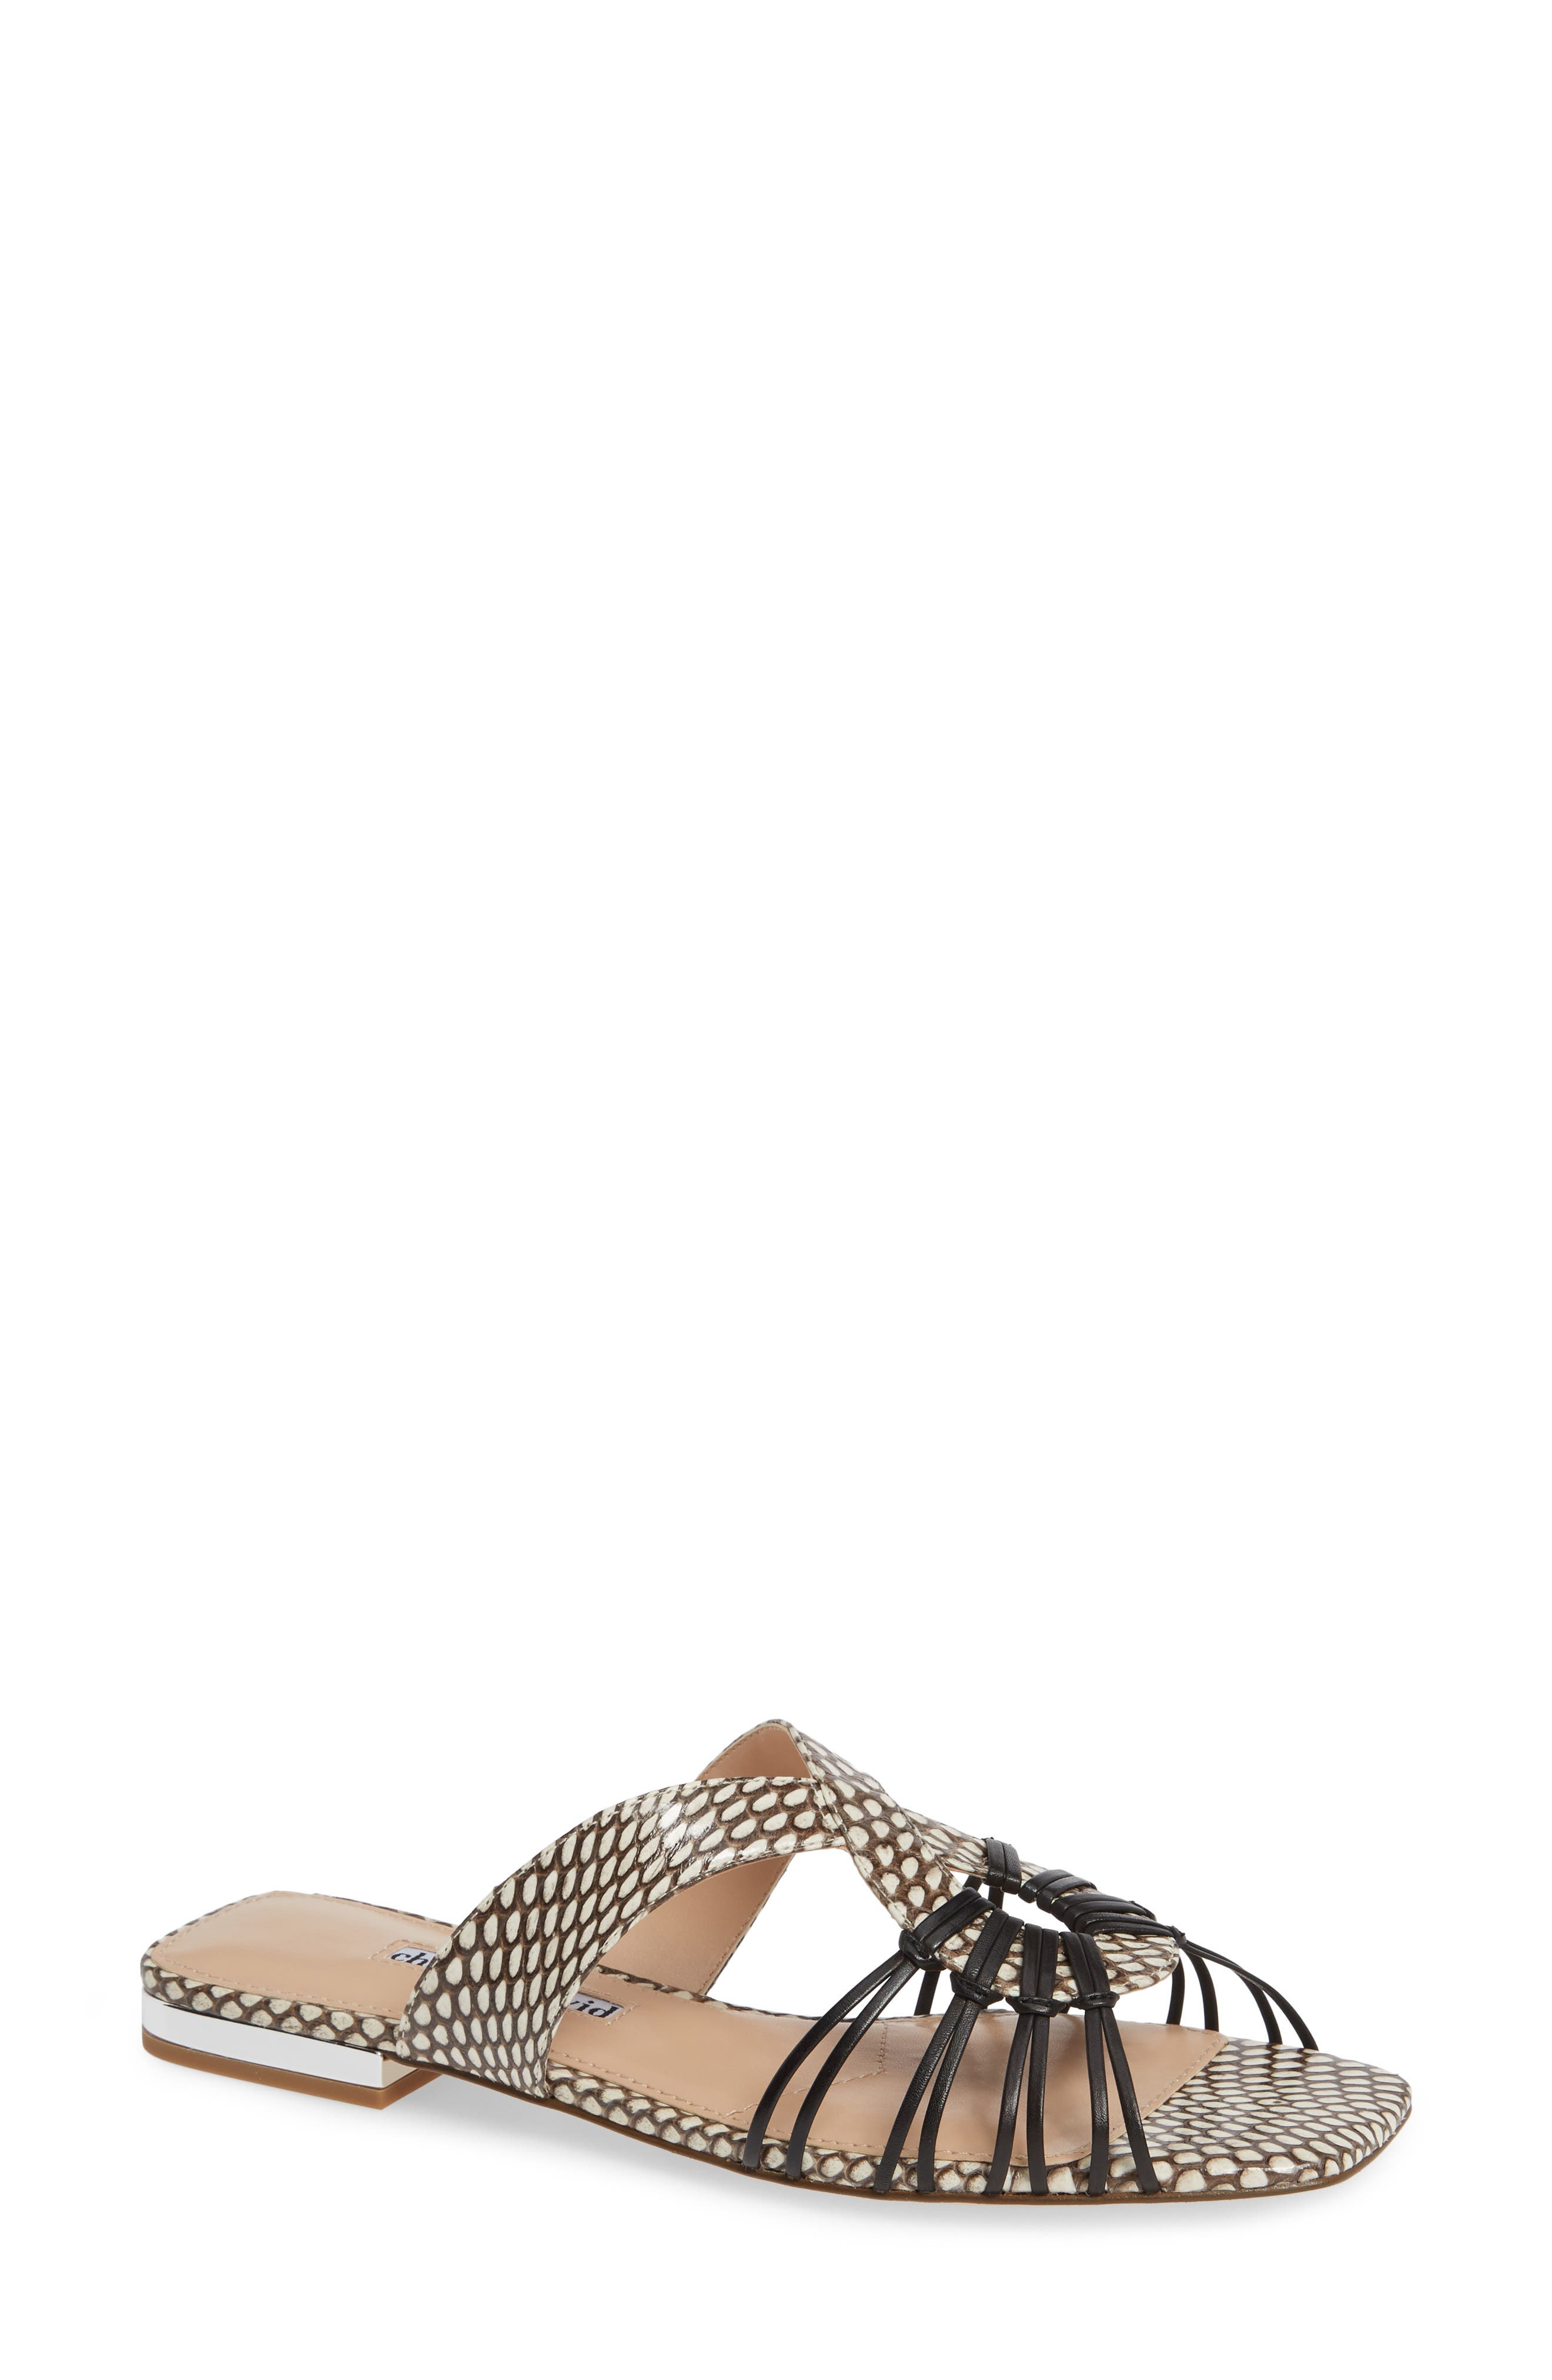 Silvy Sandal, Main, color, BLACK/WHITE SNAKE LEATHER